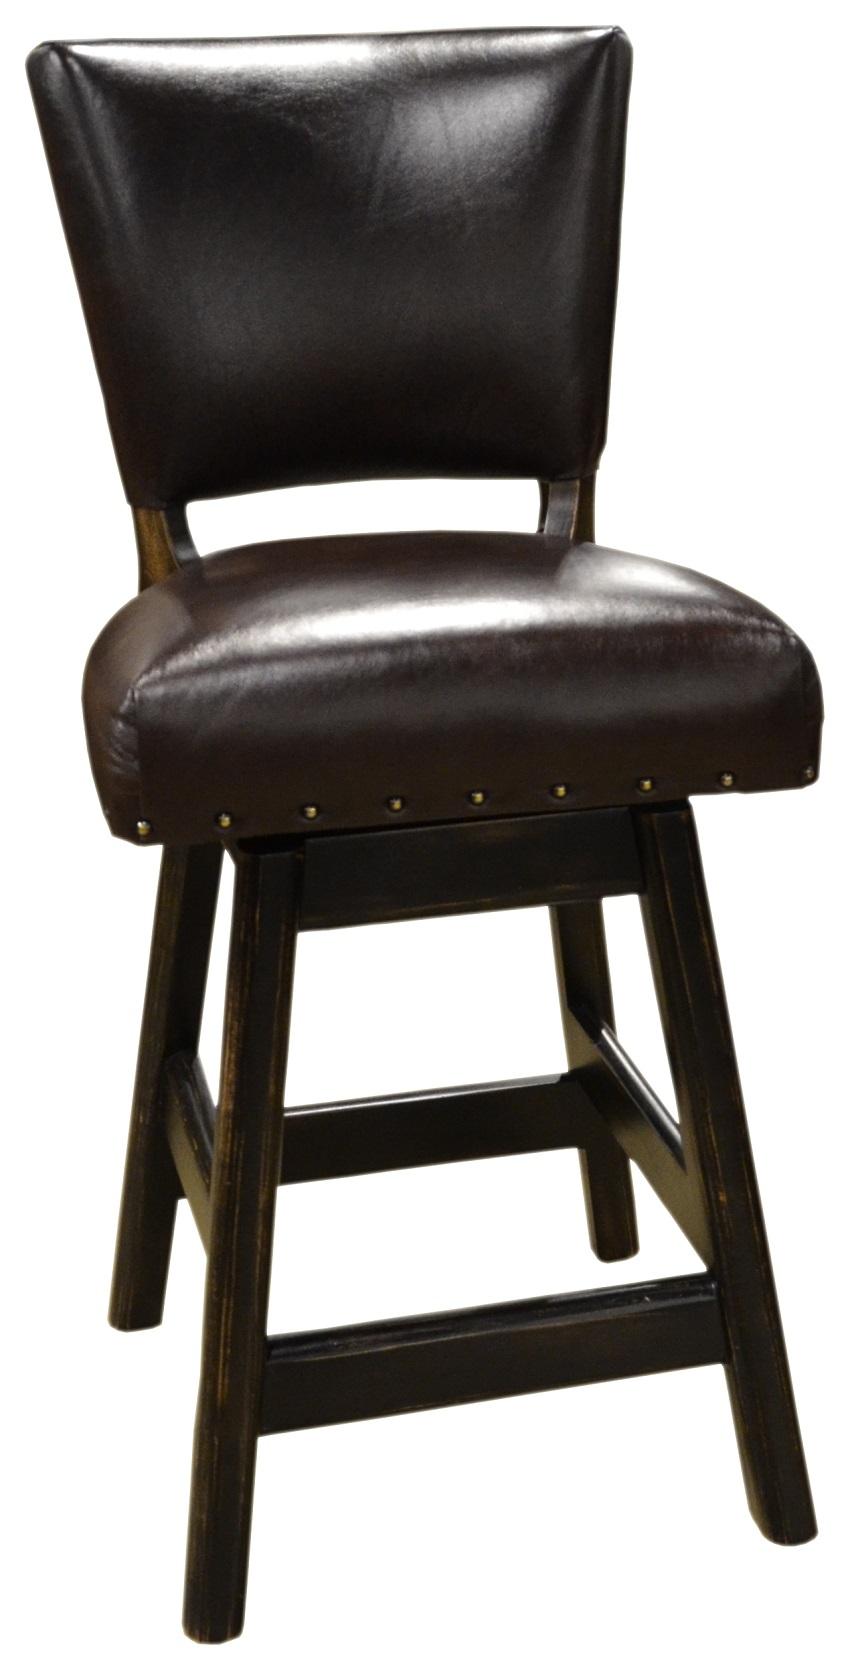 Leather Bar Stools Ranch Leather Armless Bar Stool : ranch armless bar stool from fineleatherfurniture.com size 850 x 1670 jpeg 207kB